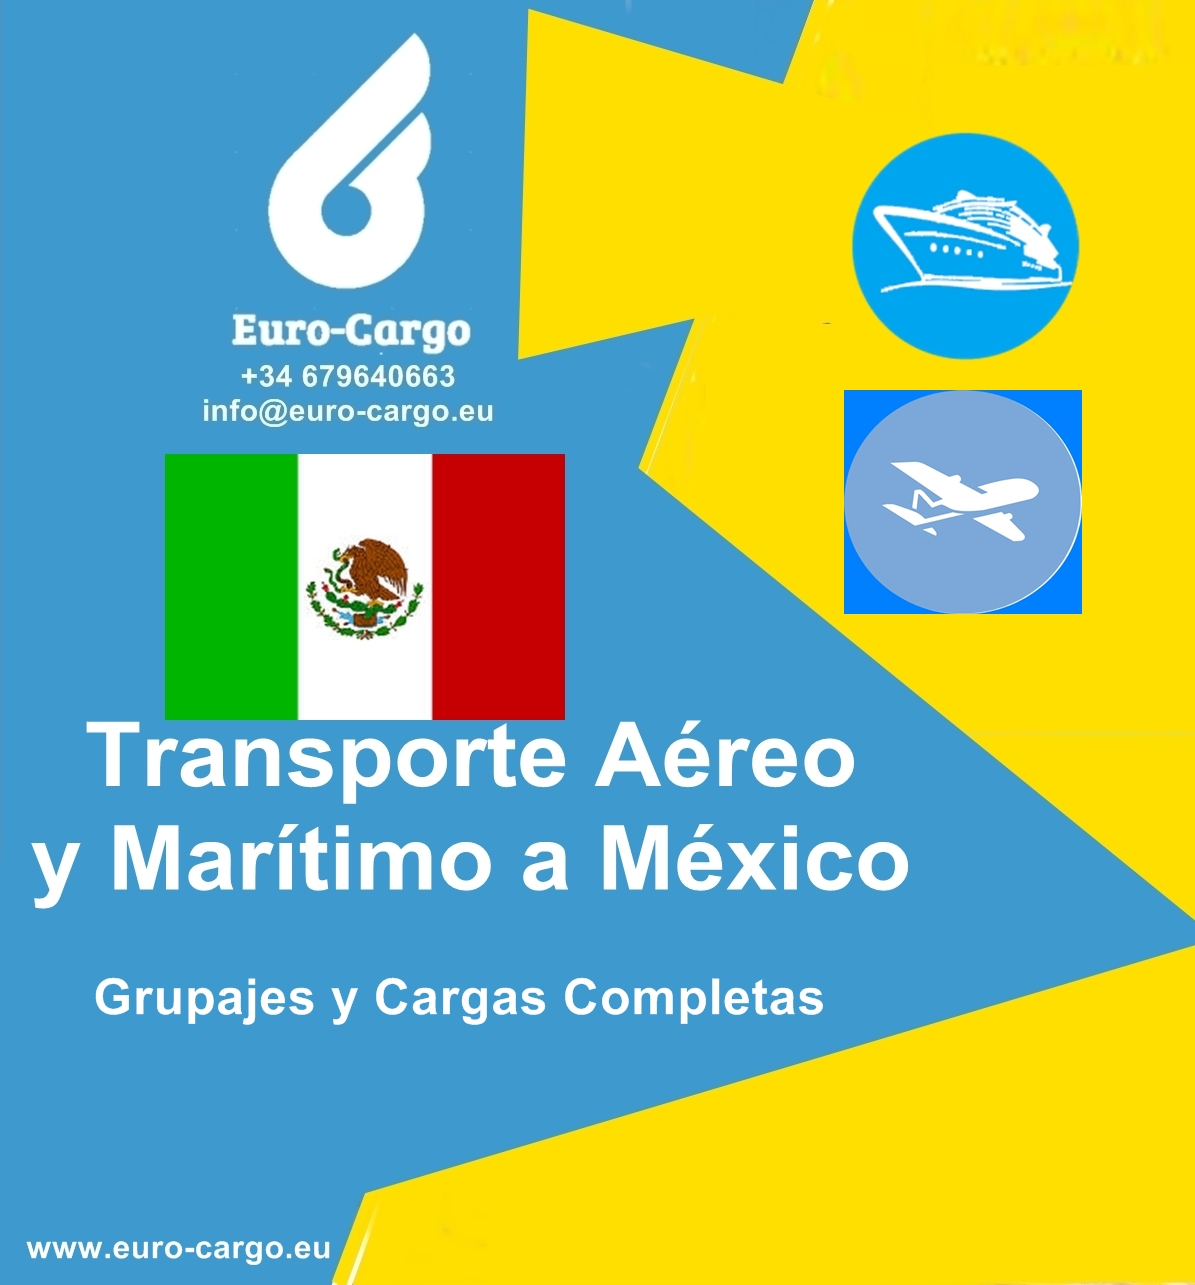 Transporte-a-mexico-1.jpg